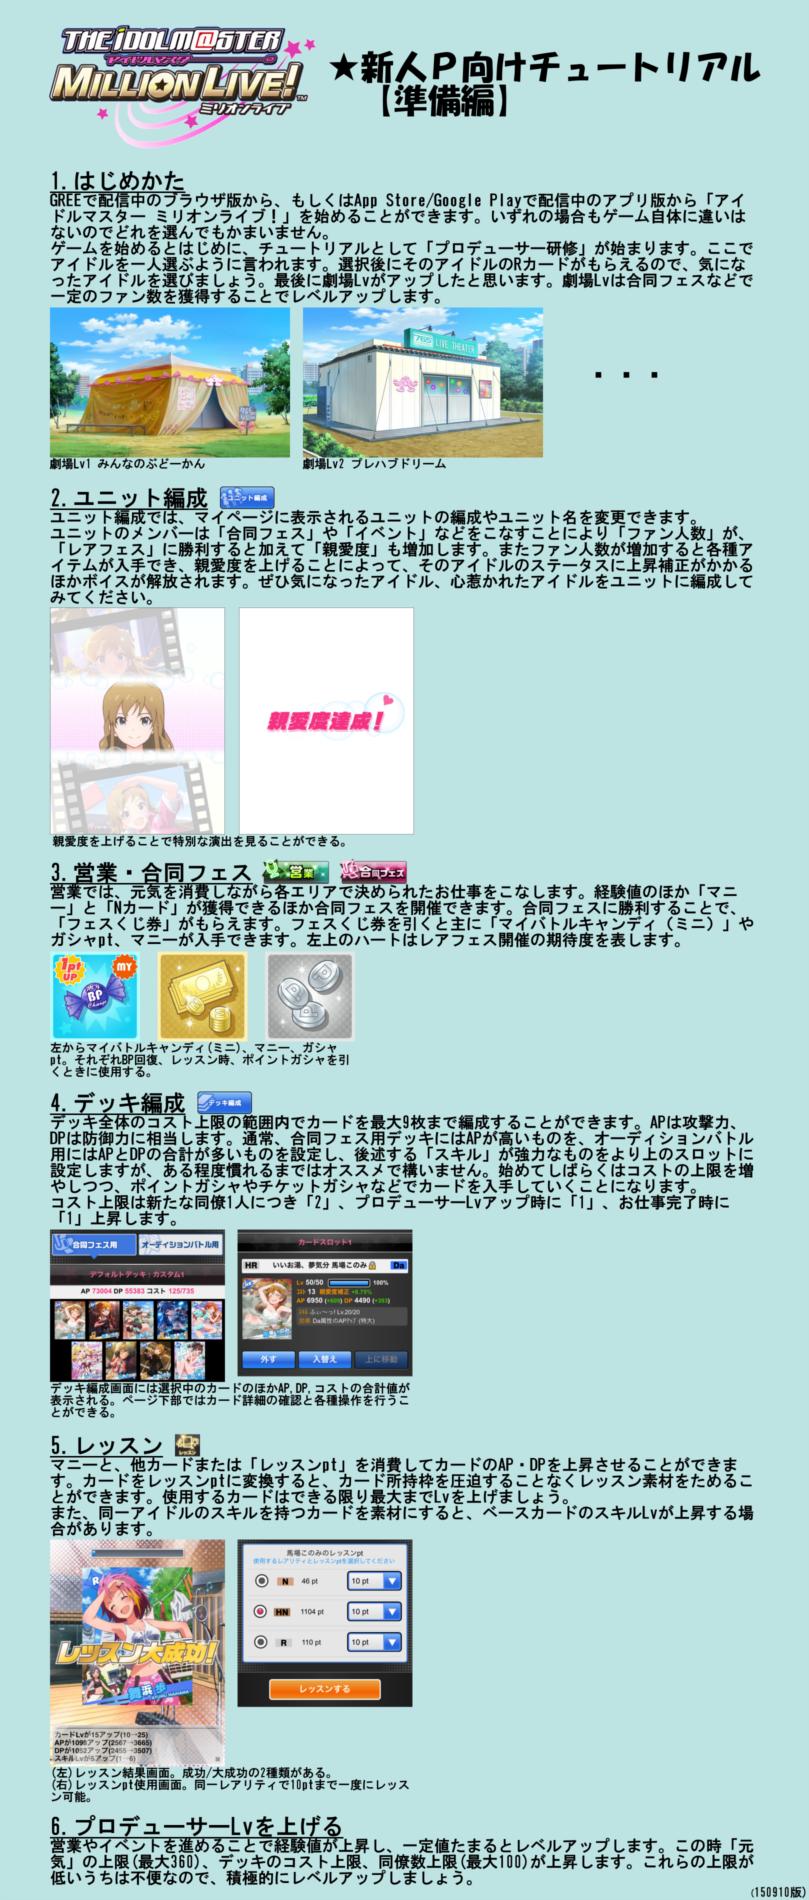 【GREE】アイドルマスターミリオンライブ!Part1456 [無断転載禁止]©2ch.netYouTube動画>1本 ->画像>107枚